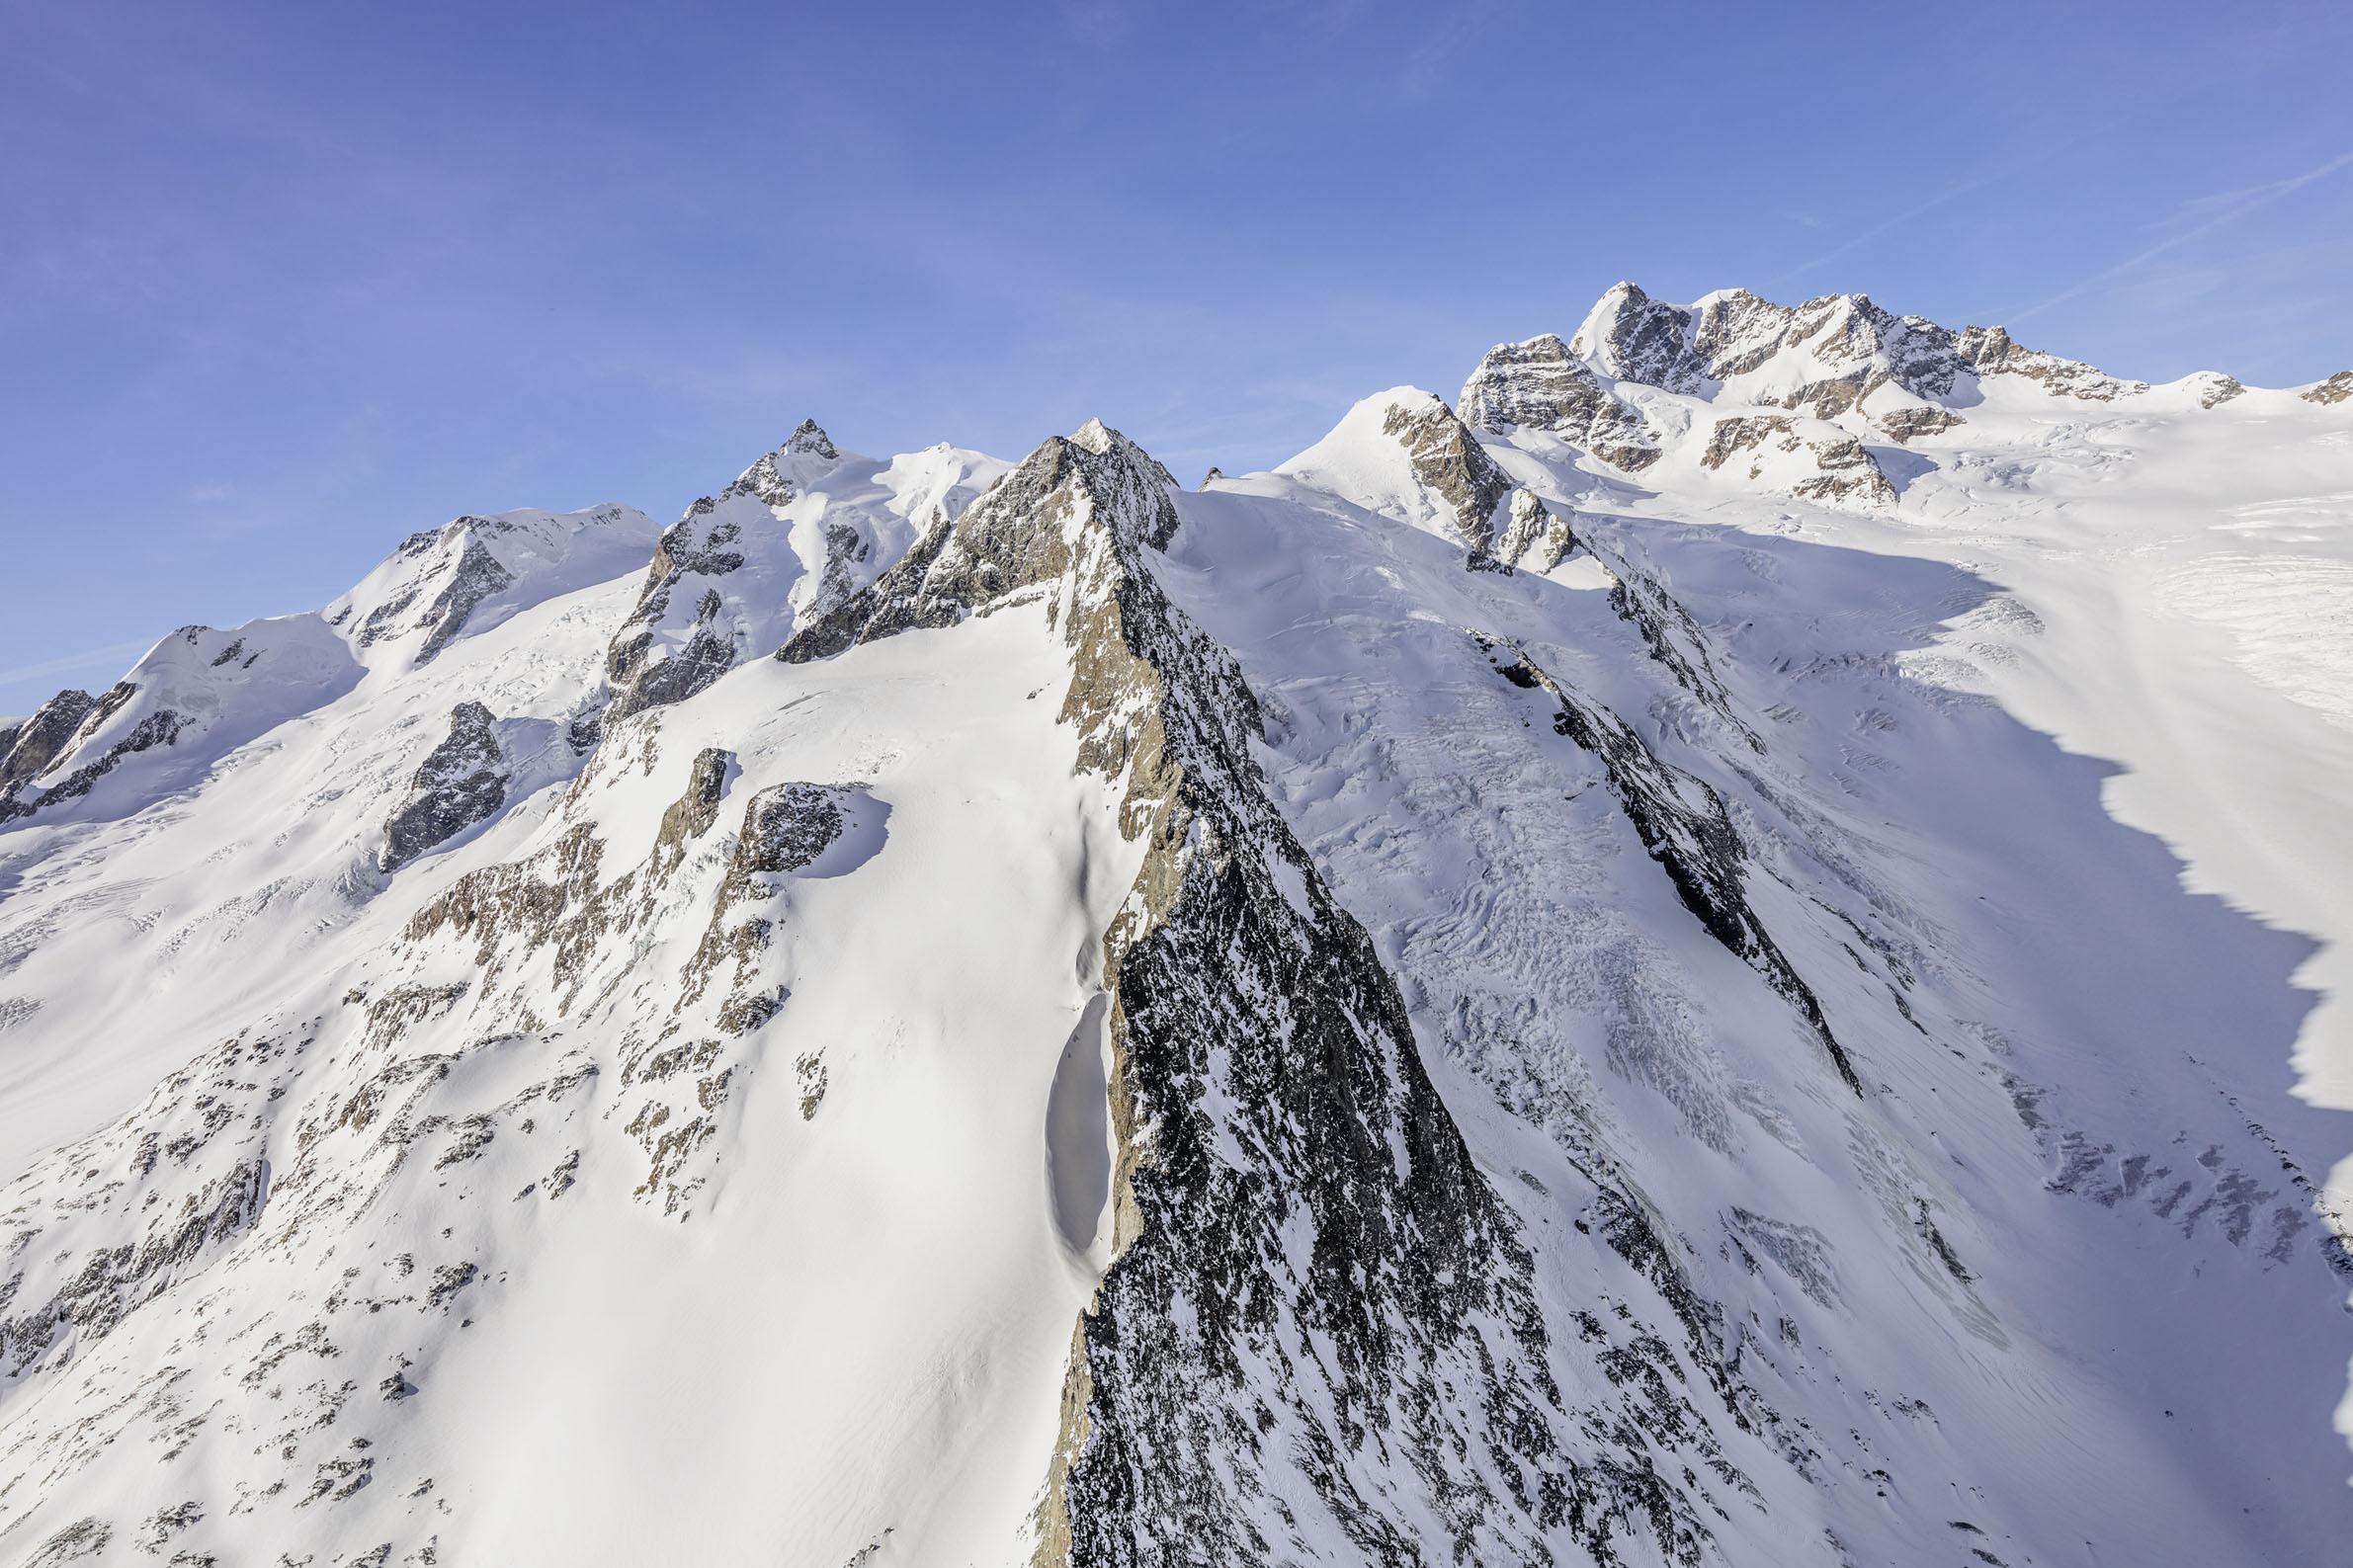 Ebenefluh Gletscherhorn Jungfrau_1S8A4474.jpg